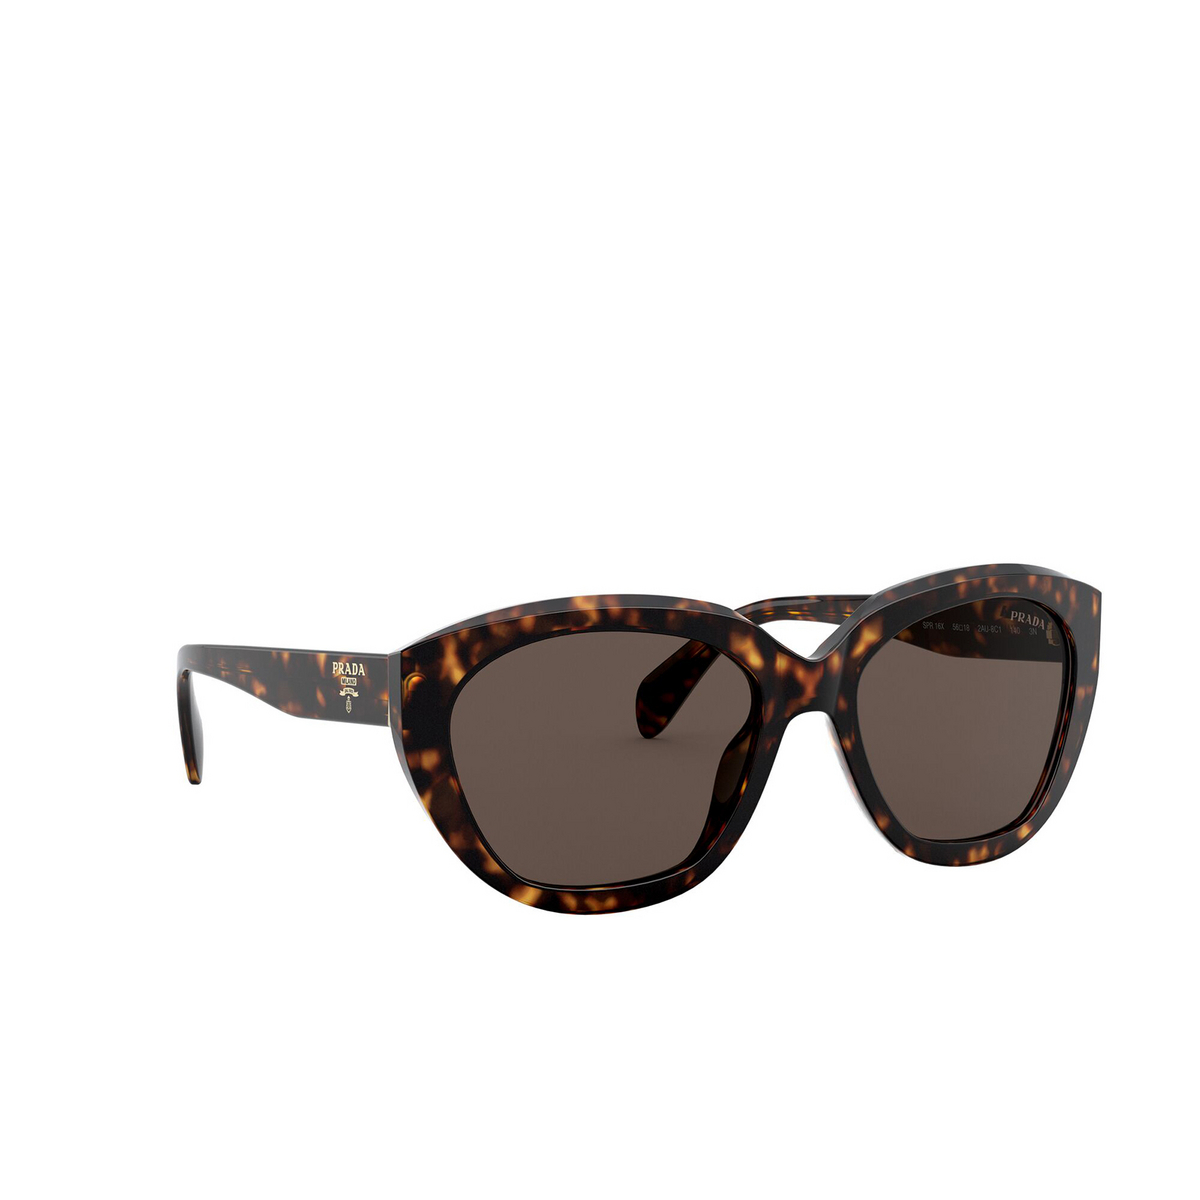 Prada® Butterfly Sunglasses: PR 16XS color Havana 2AU8C1 - three-quarters view.